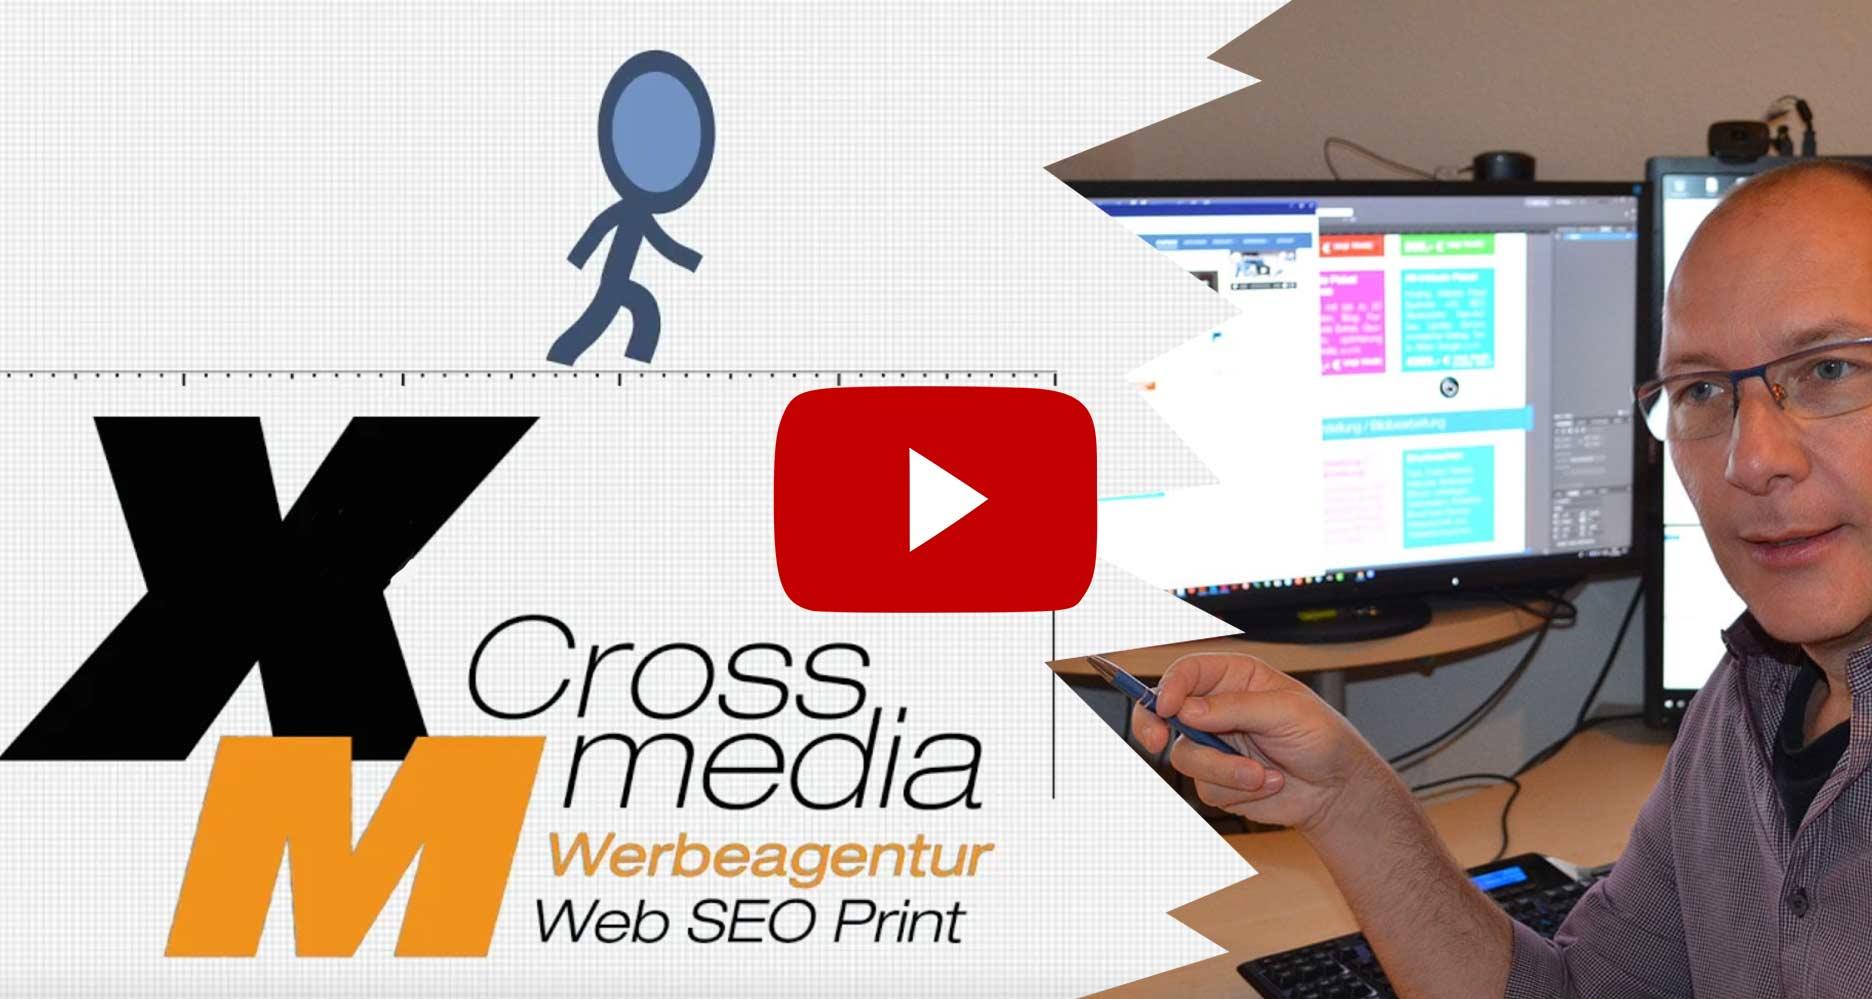 Tim-Rautenberg-Crossmedia-Video-2021